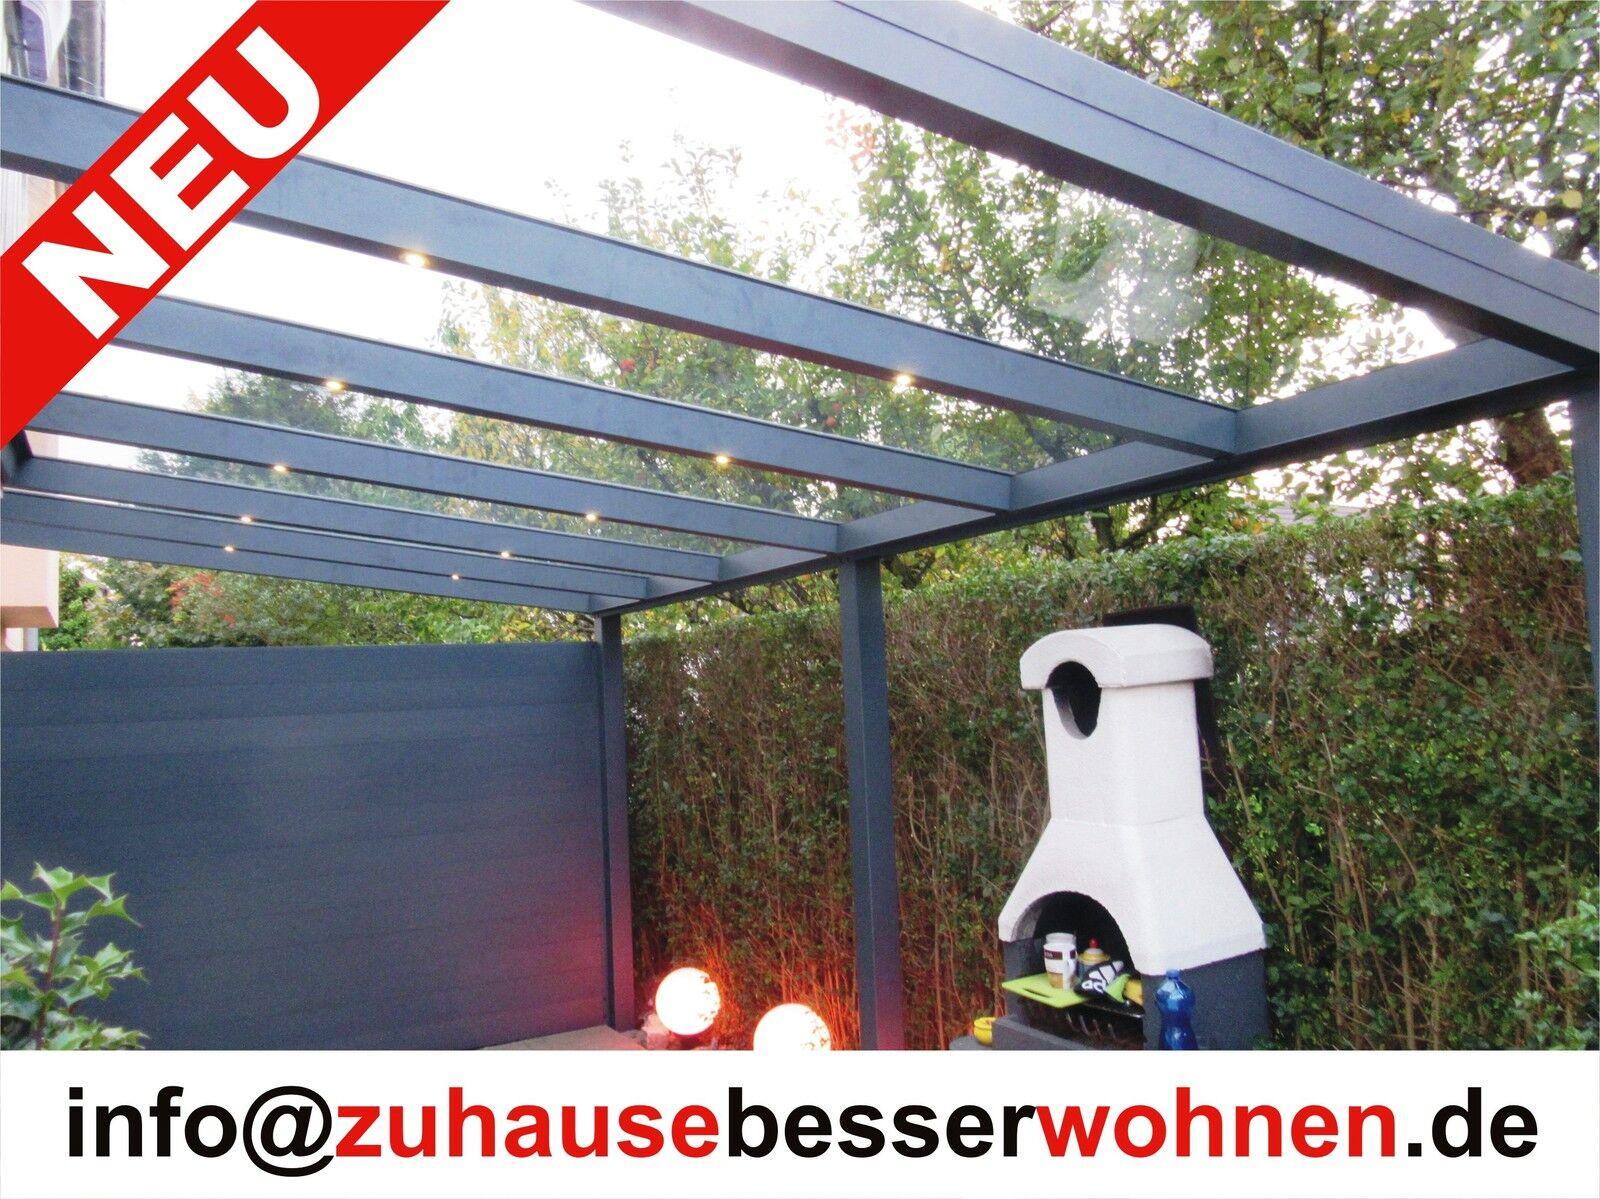 terrassen berdachung carport berdachung aluminium terrassendach vsg glas 3x3m eur. Black Bedroom Furniture Sets. Home Design Ideas